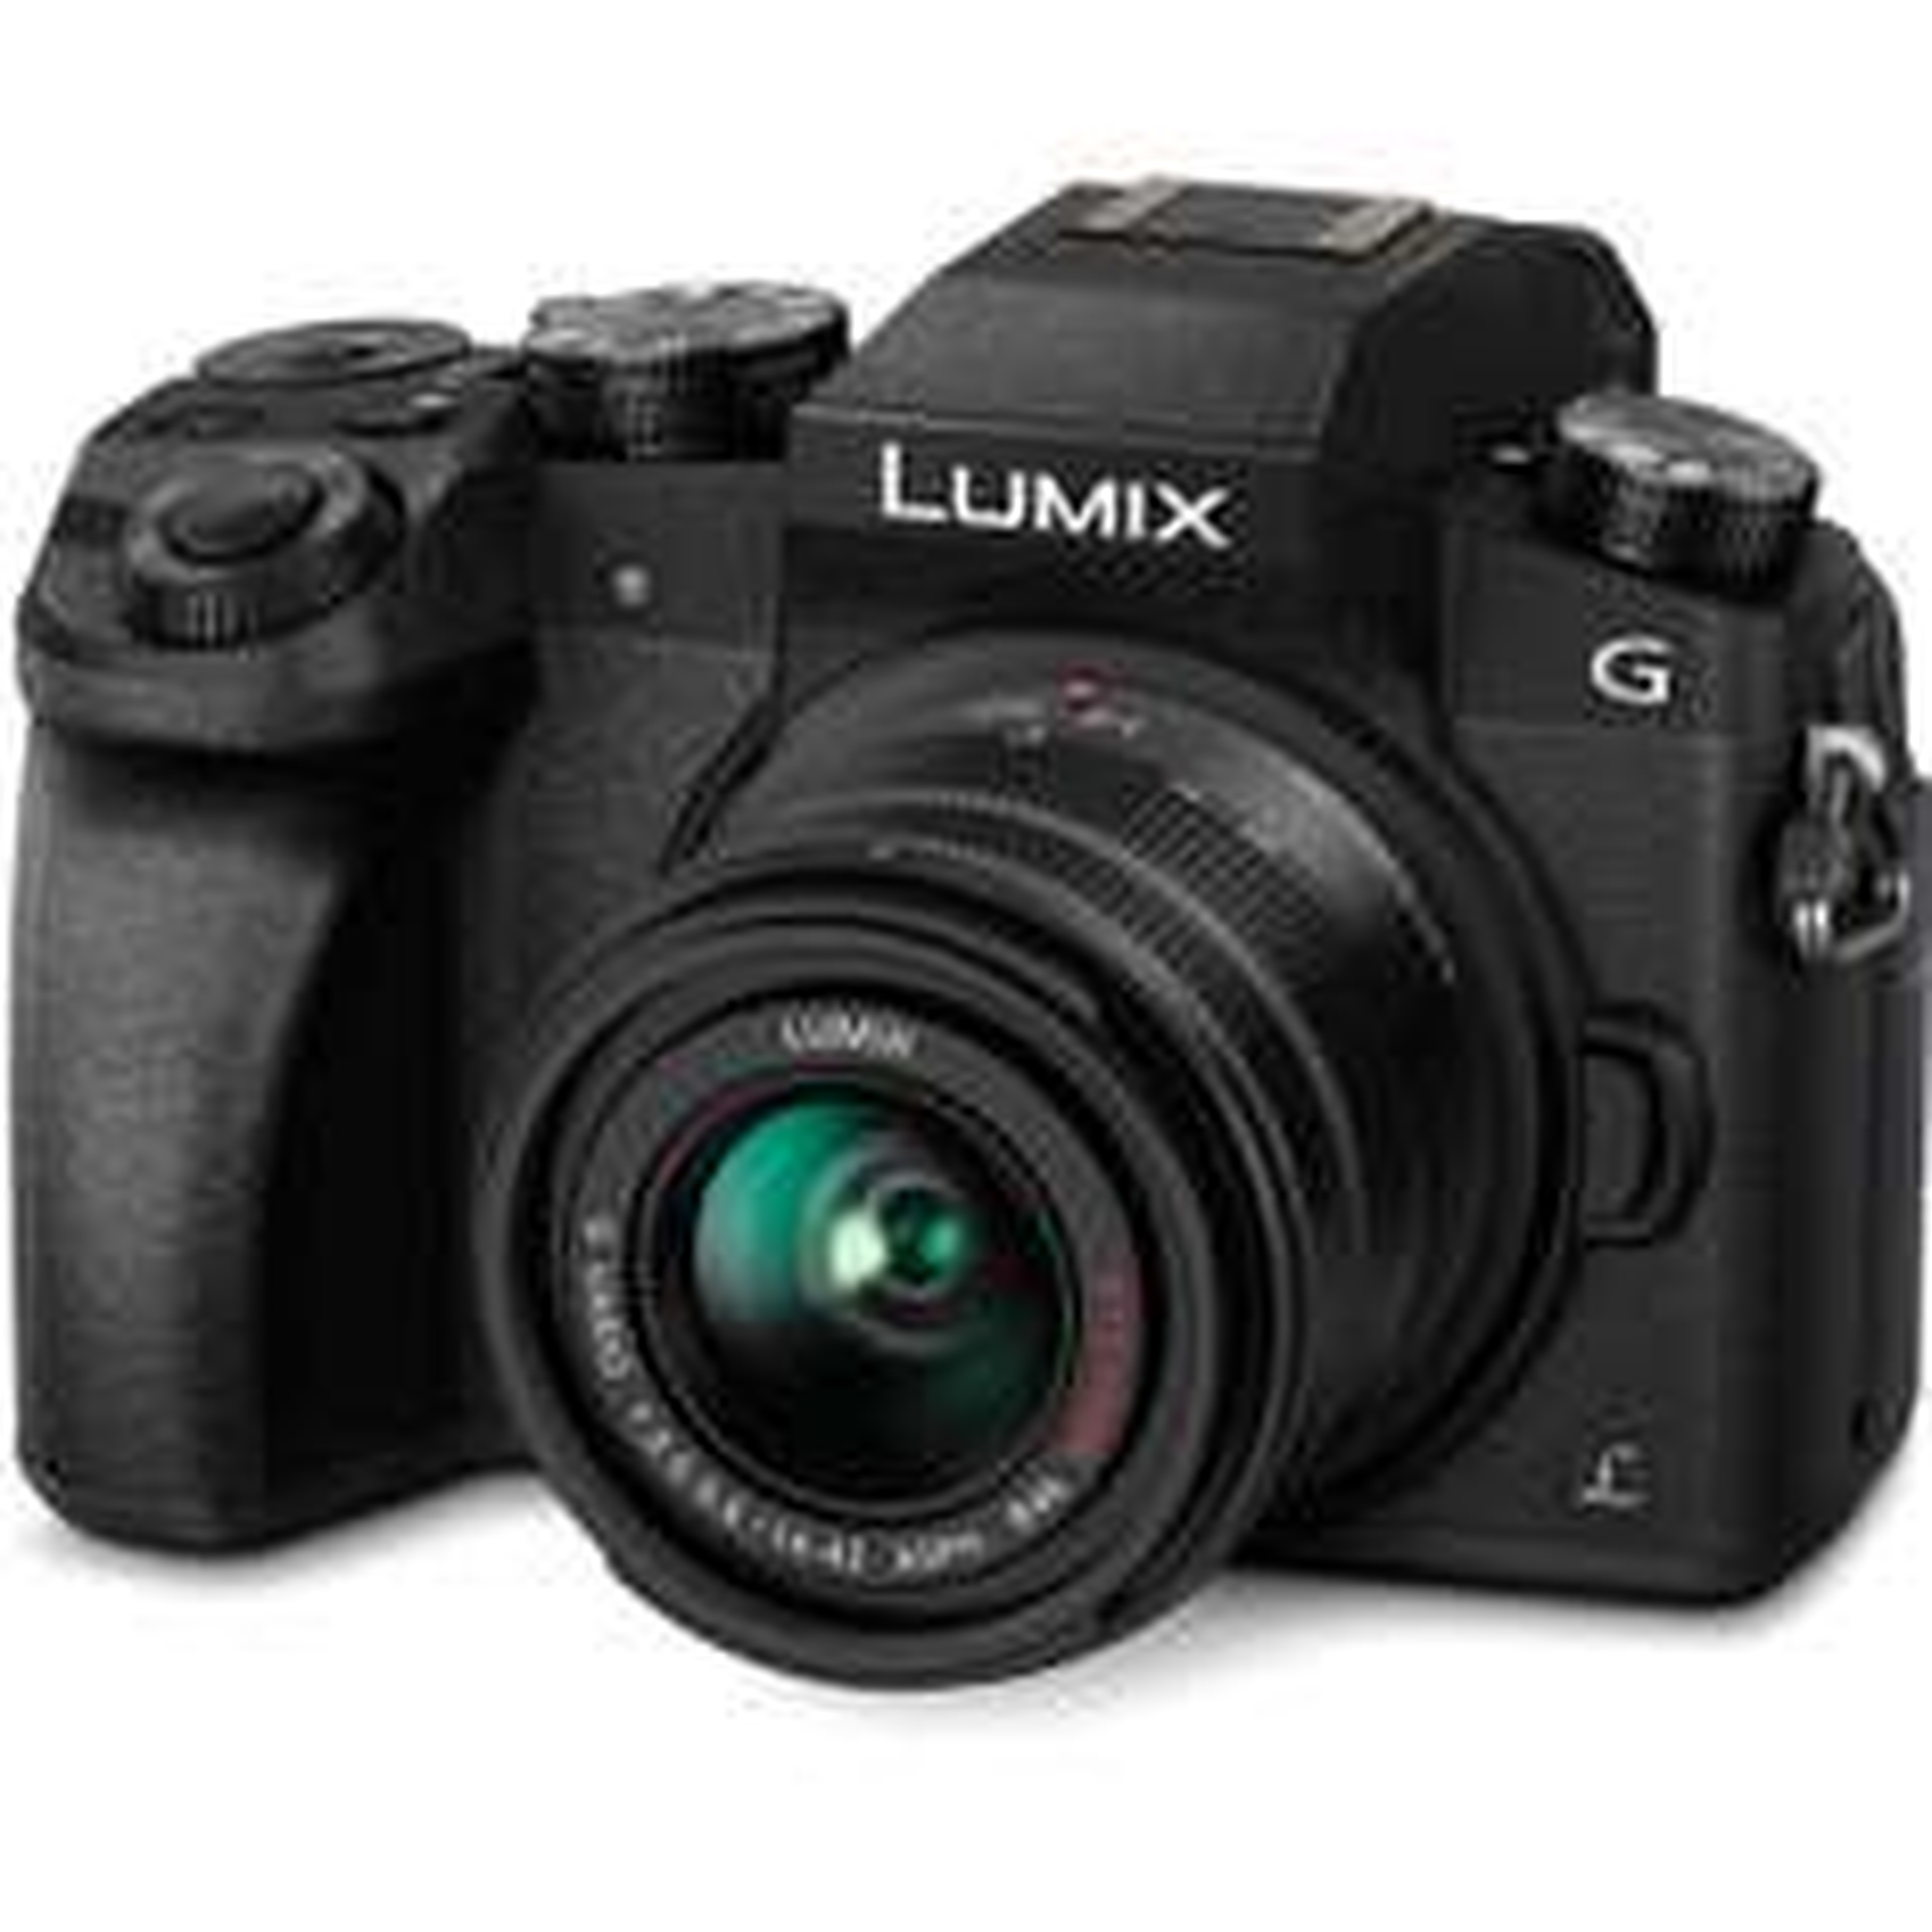 Appareil photo Panasonic Lumix DMC-G7 avec objectif 14-42mm